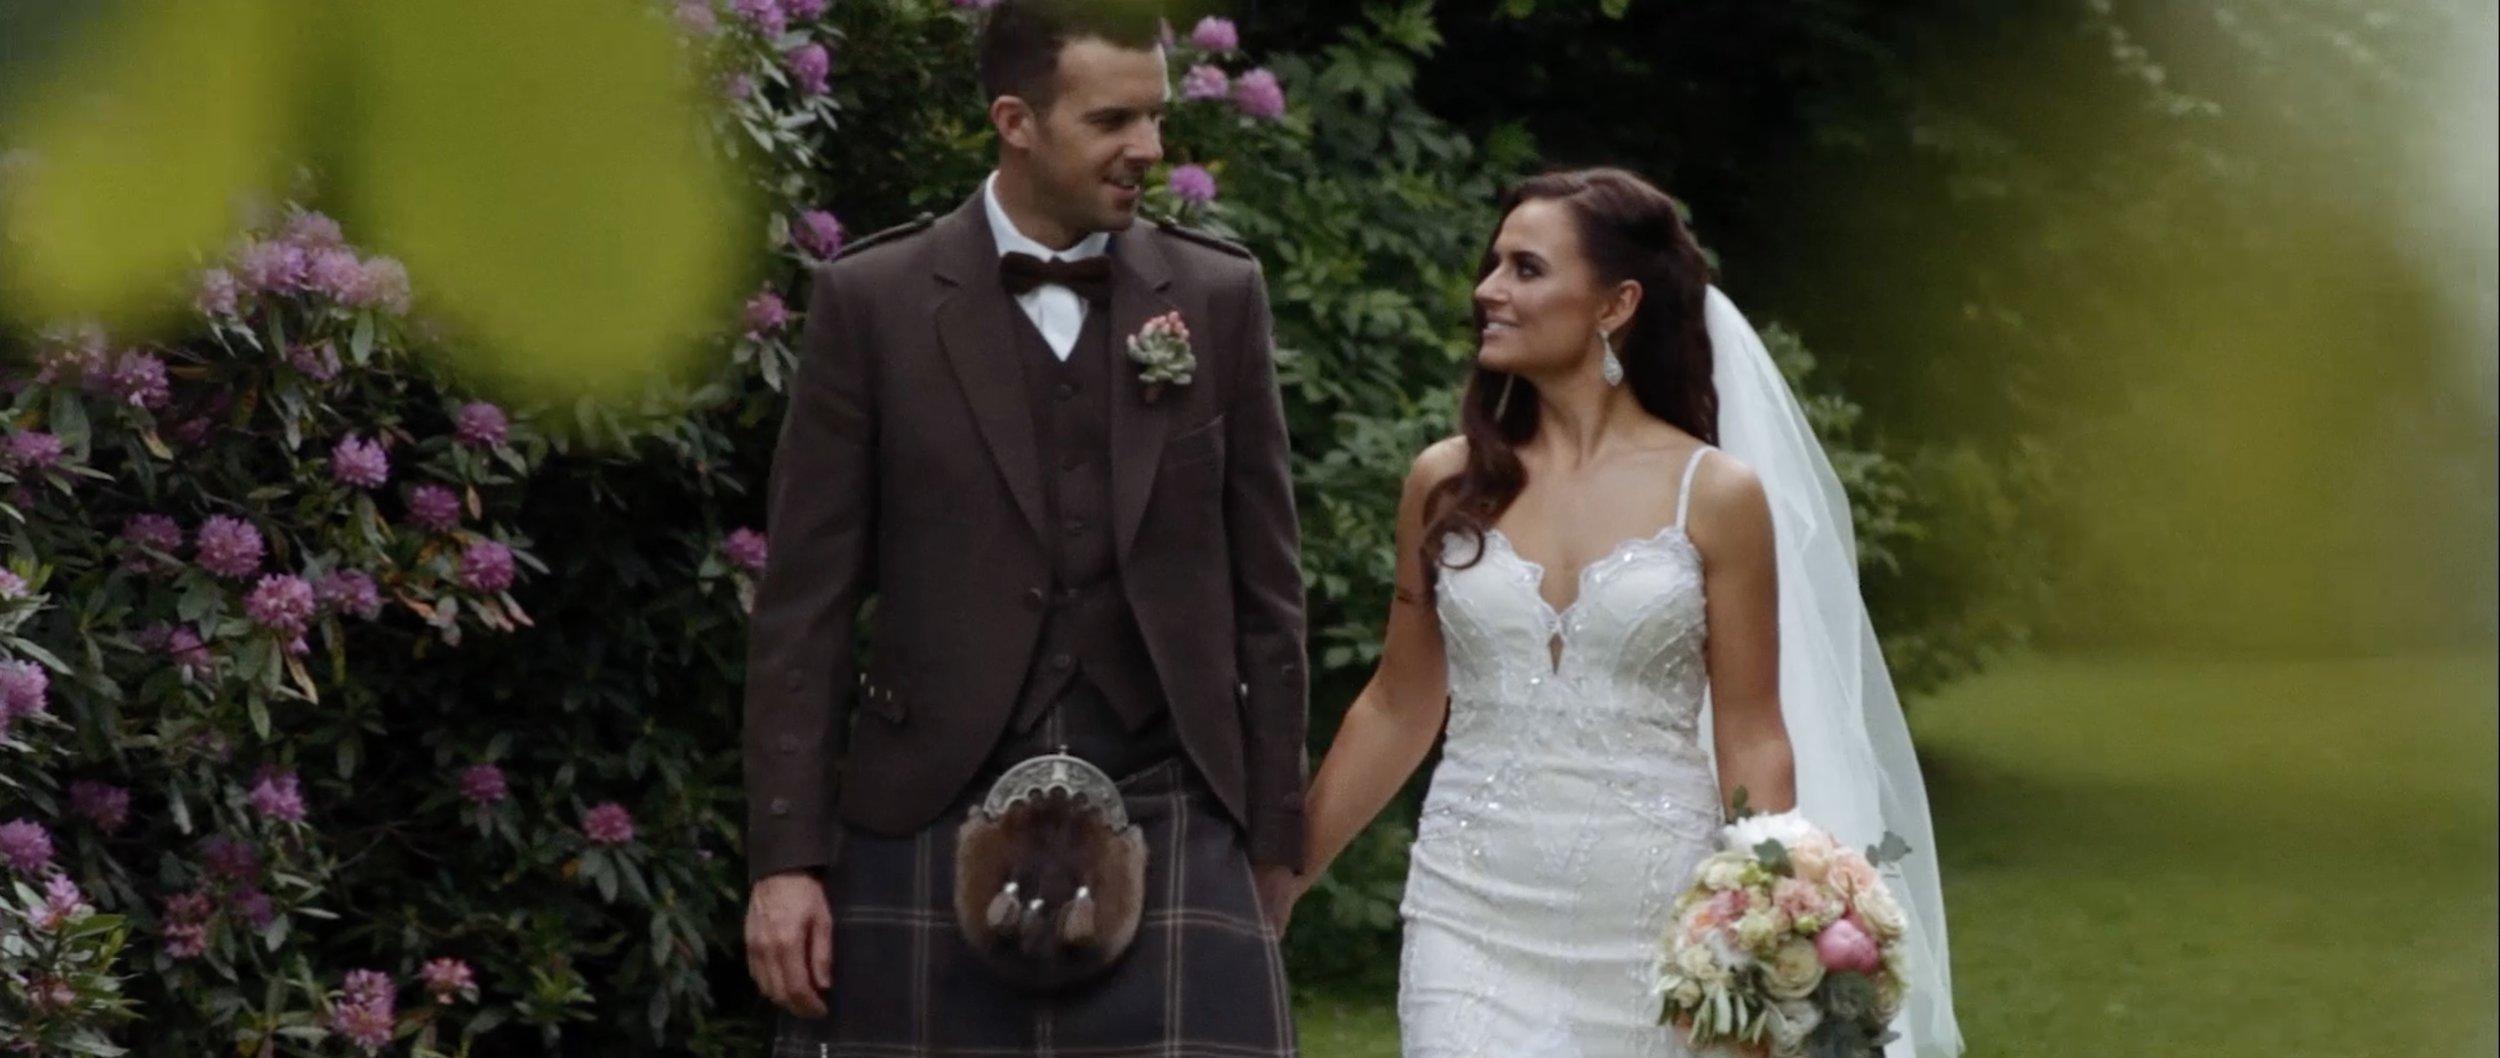 the-byre-at-inchyra-wedding-videographer_LL_06.jpg